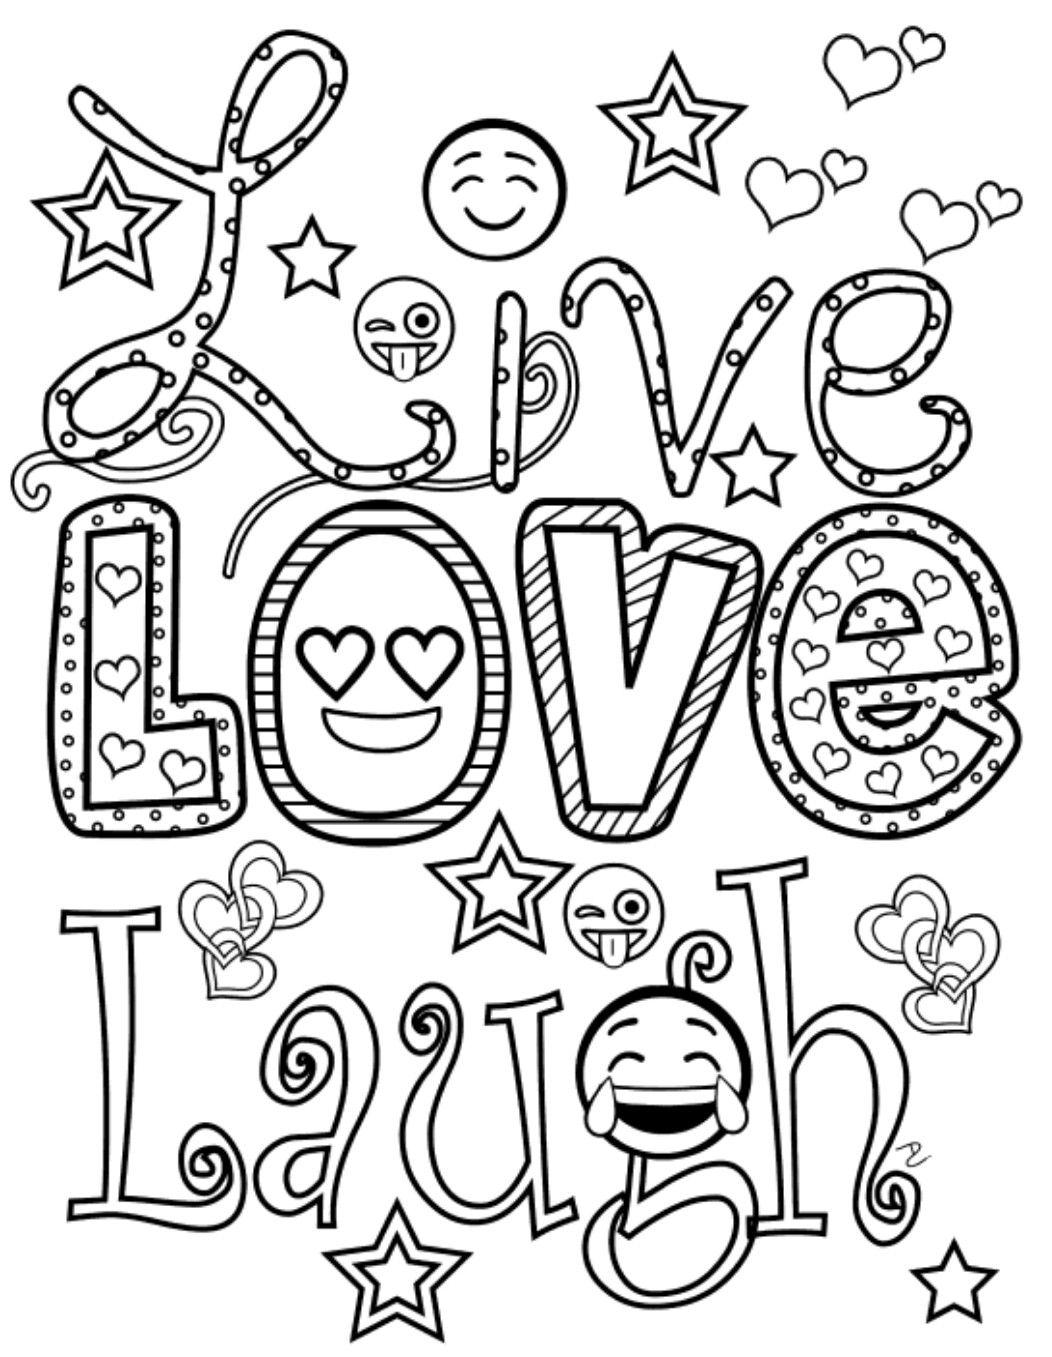 Pin de Highly_Favored en color me emoji | Pinterest | Dibujos ...